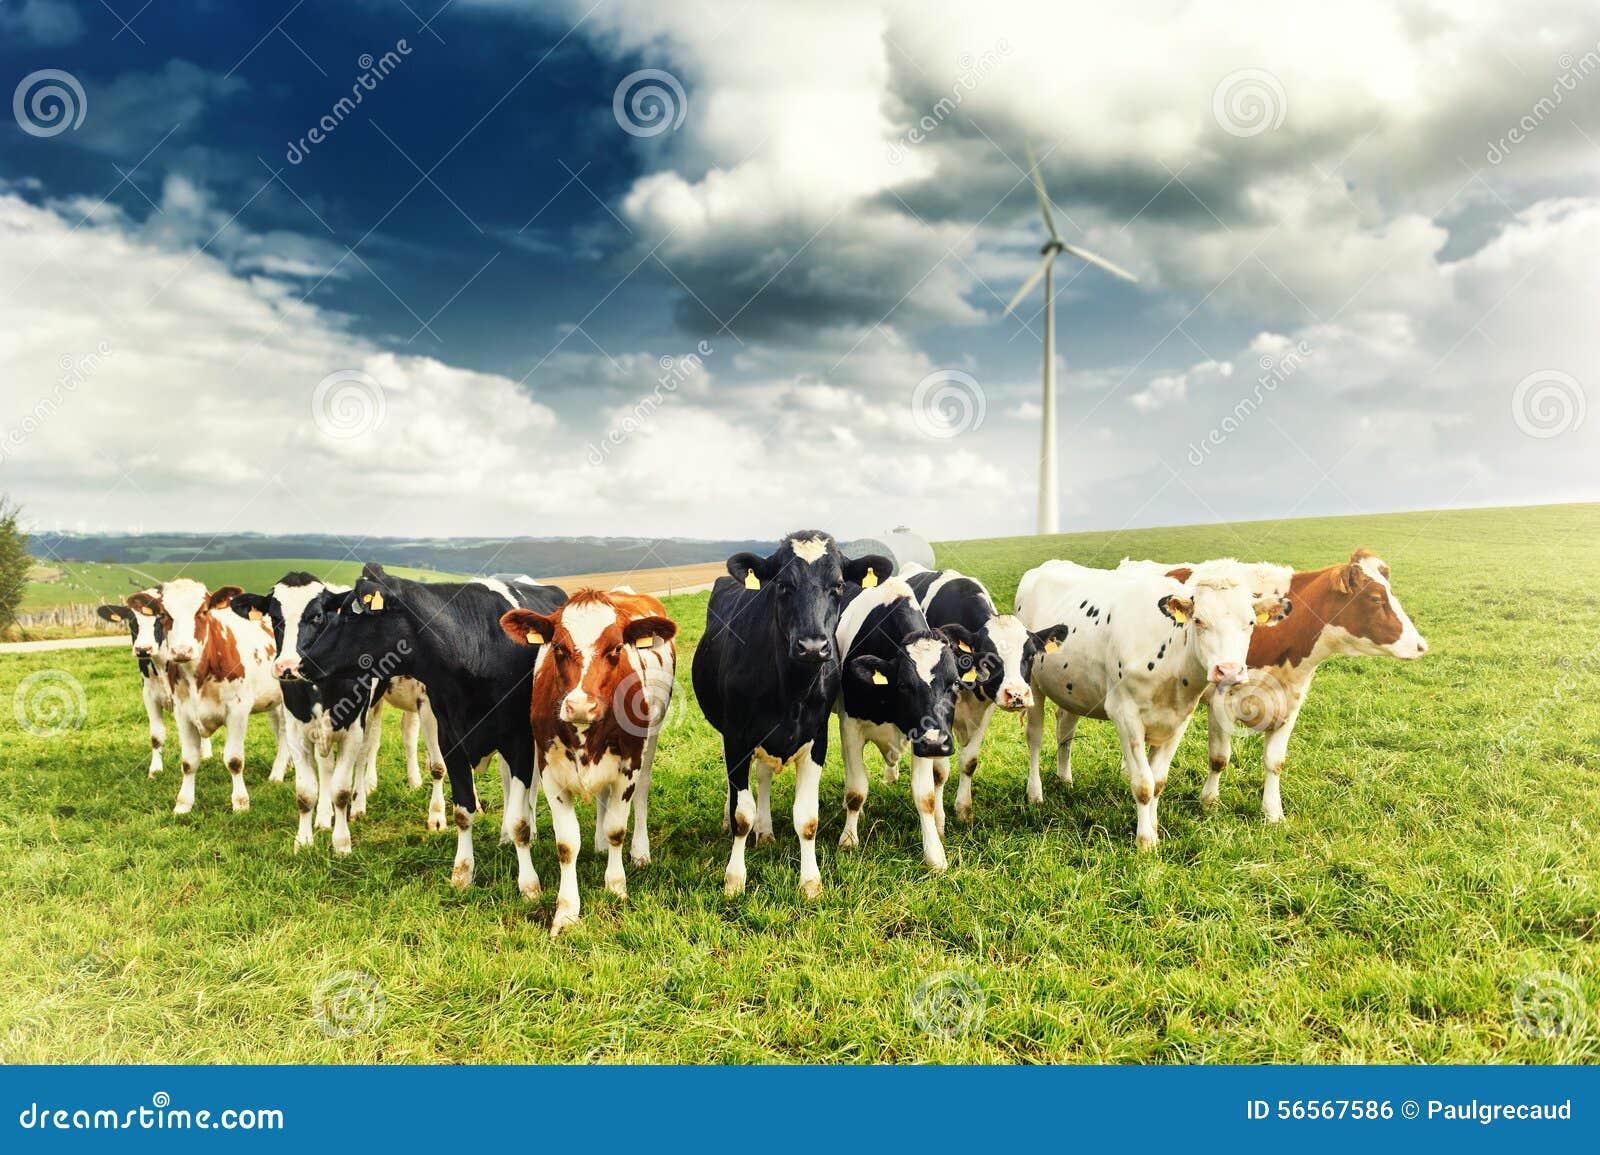 Download Γεωργικό τοπίο με το κοπάδι των αγελάδων Στοκ Εικόνες - εικόνα από πράσινος, βακκινίων: 56567586